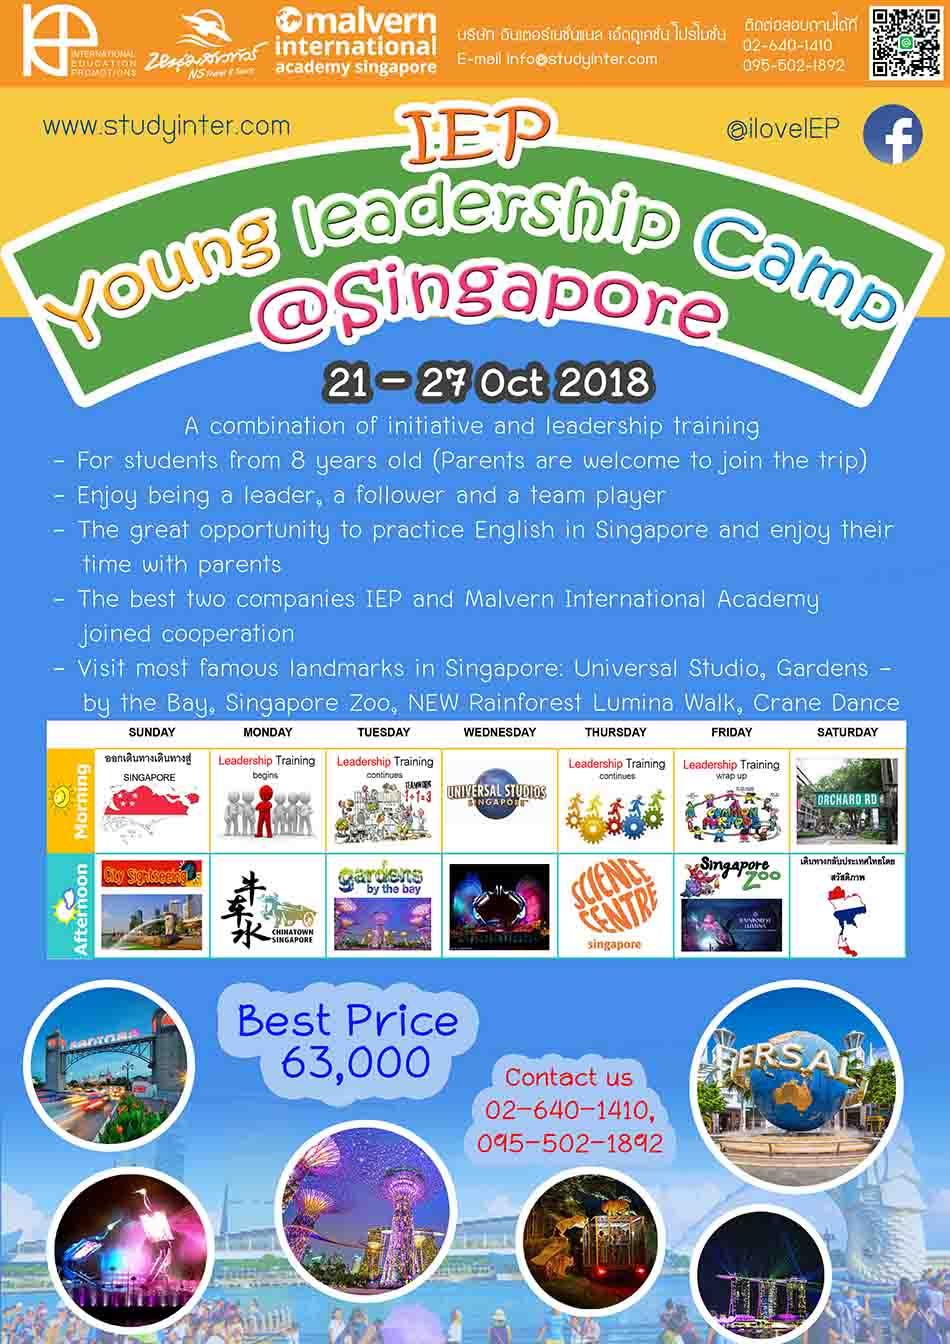 Malvern International Academy – Young Leadership English Summer Camp in Singapore